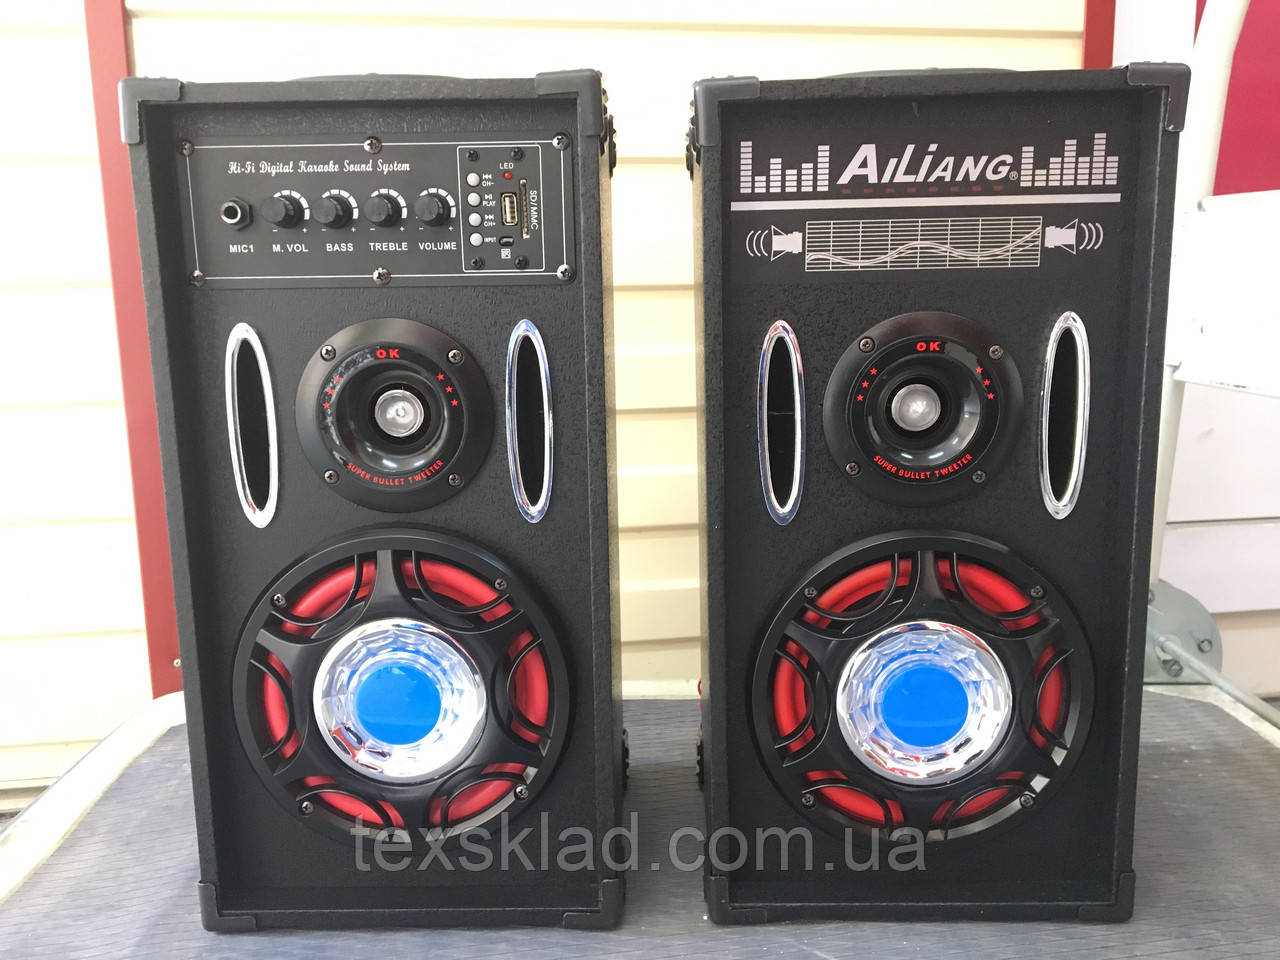 Колонки USBFM-605K-DT (USB/FM/Bluetooth/Радио)